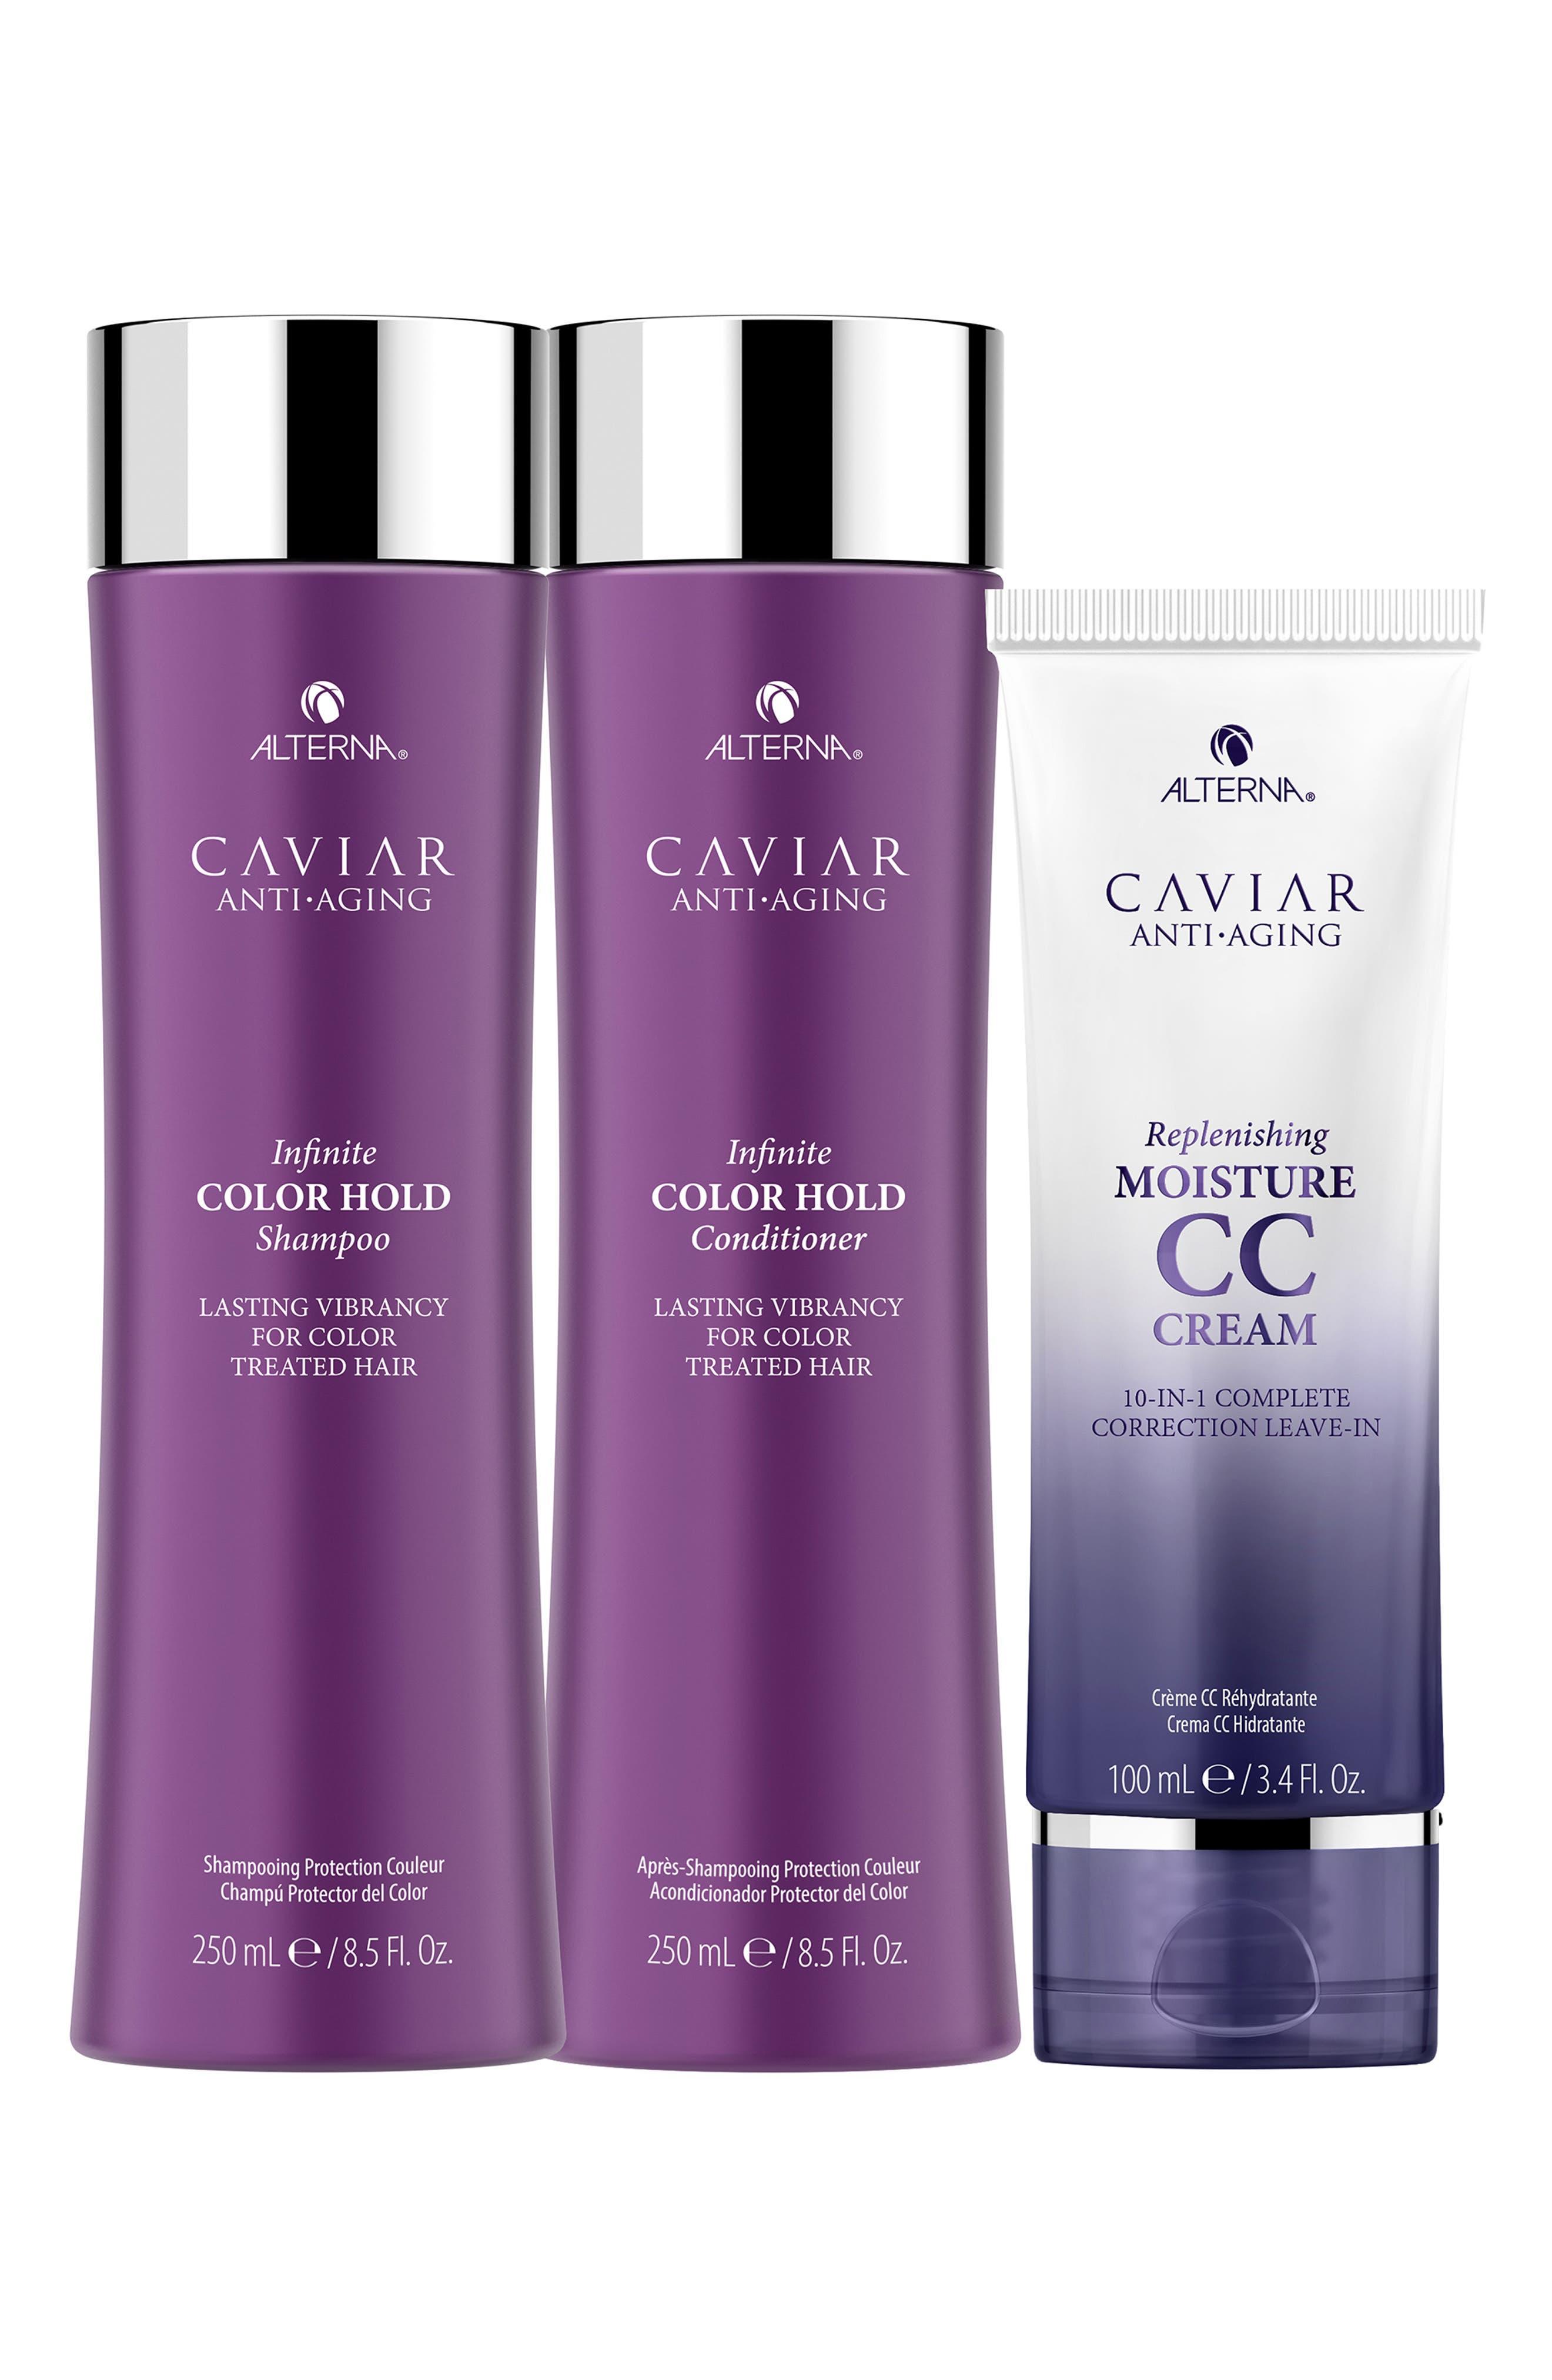 Alterna Caviar Anti-Aging Infinite Color Hold Holiday Kit